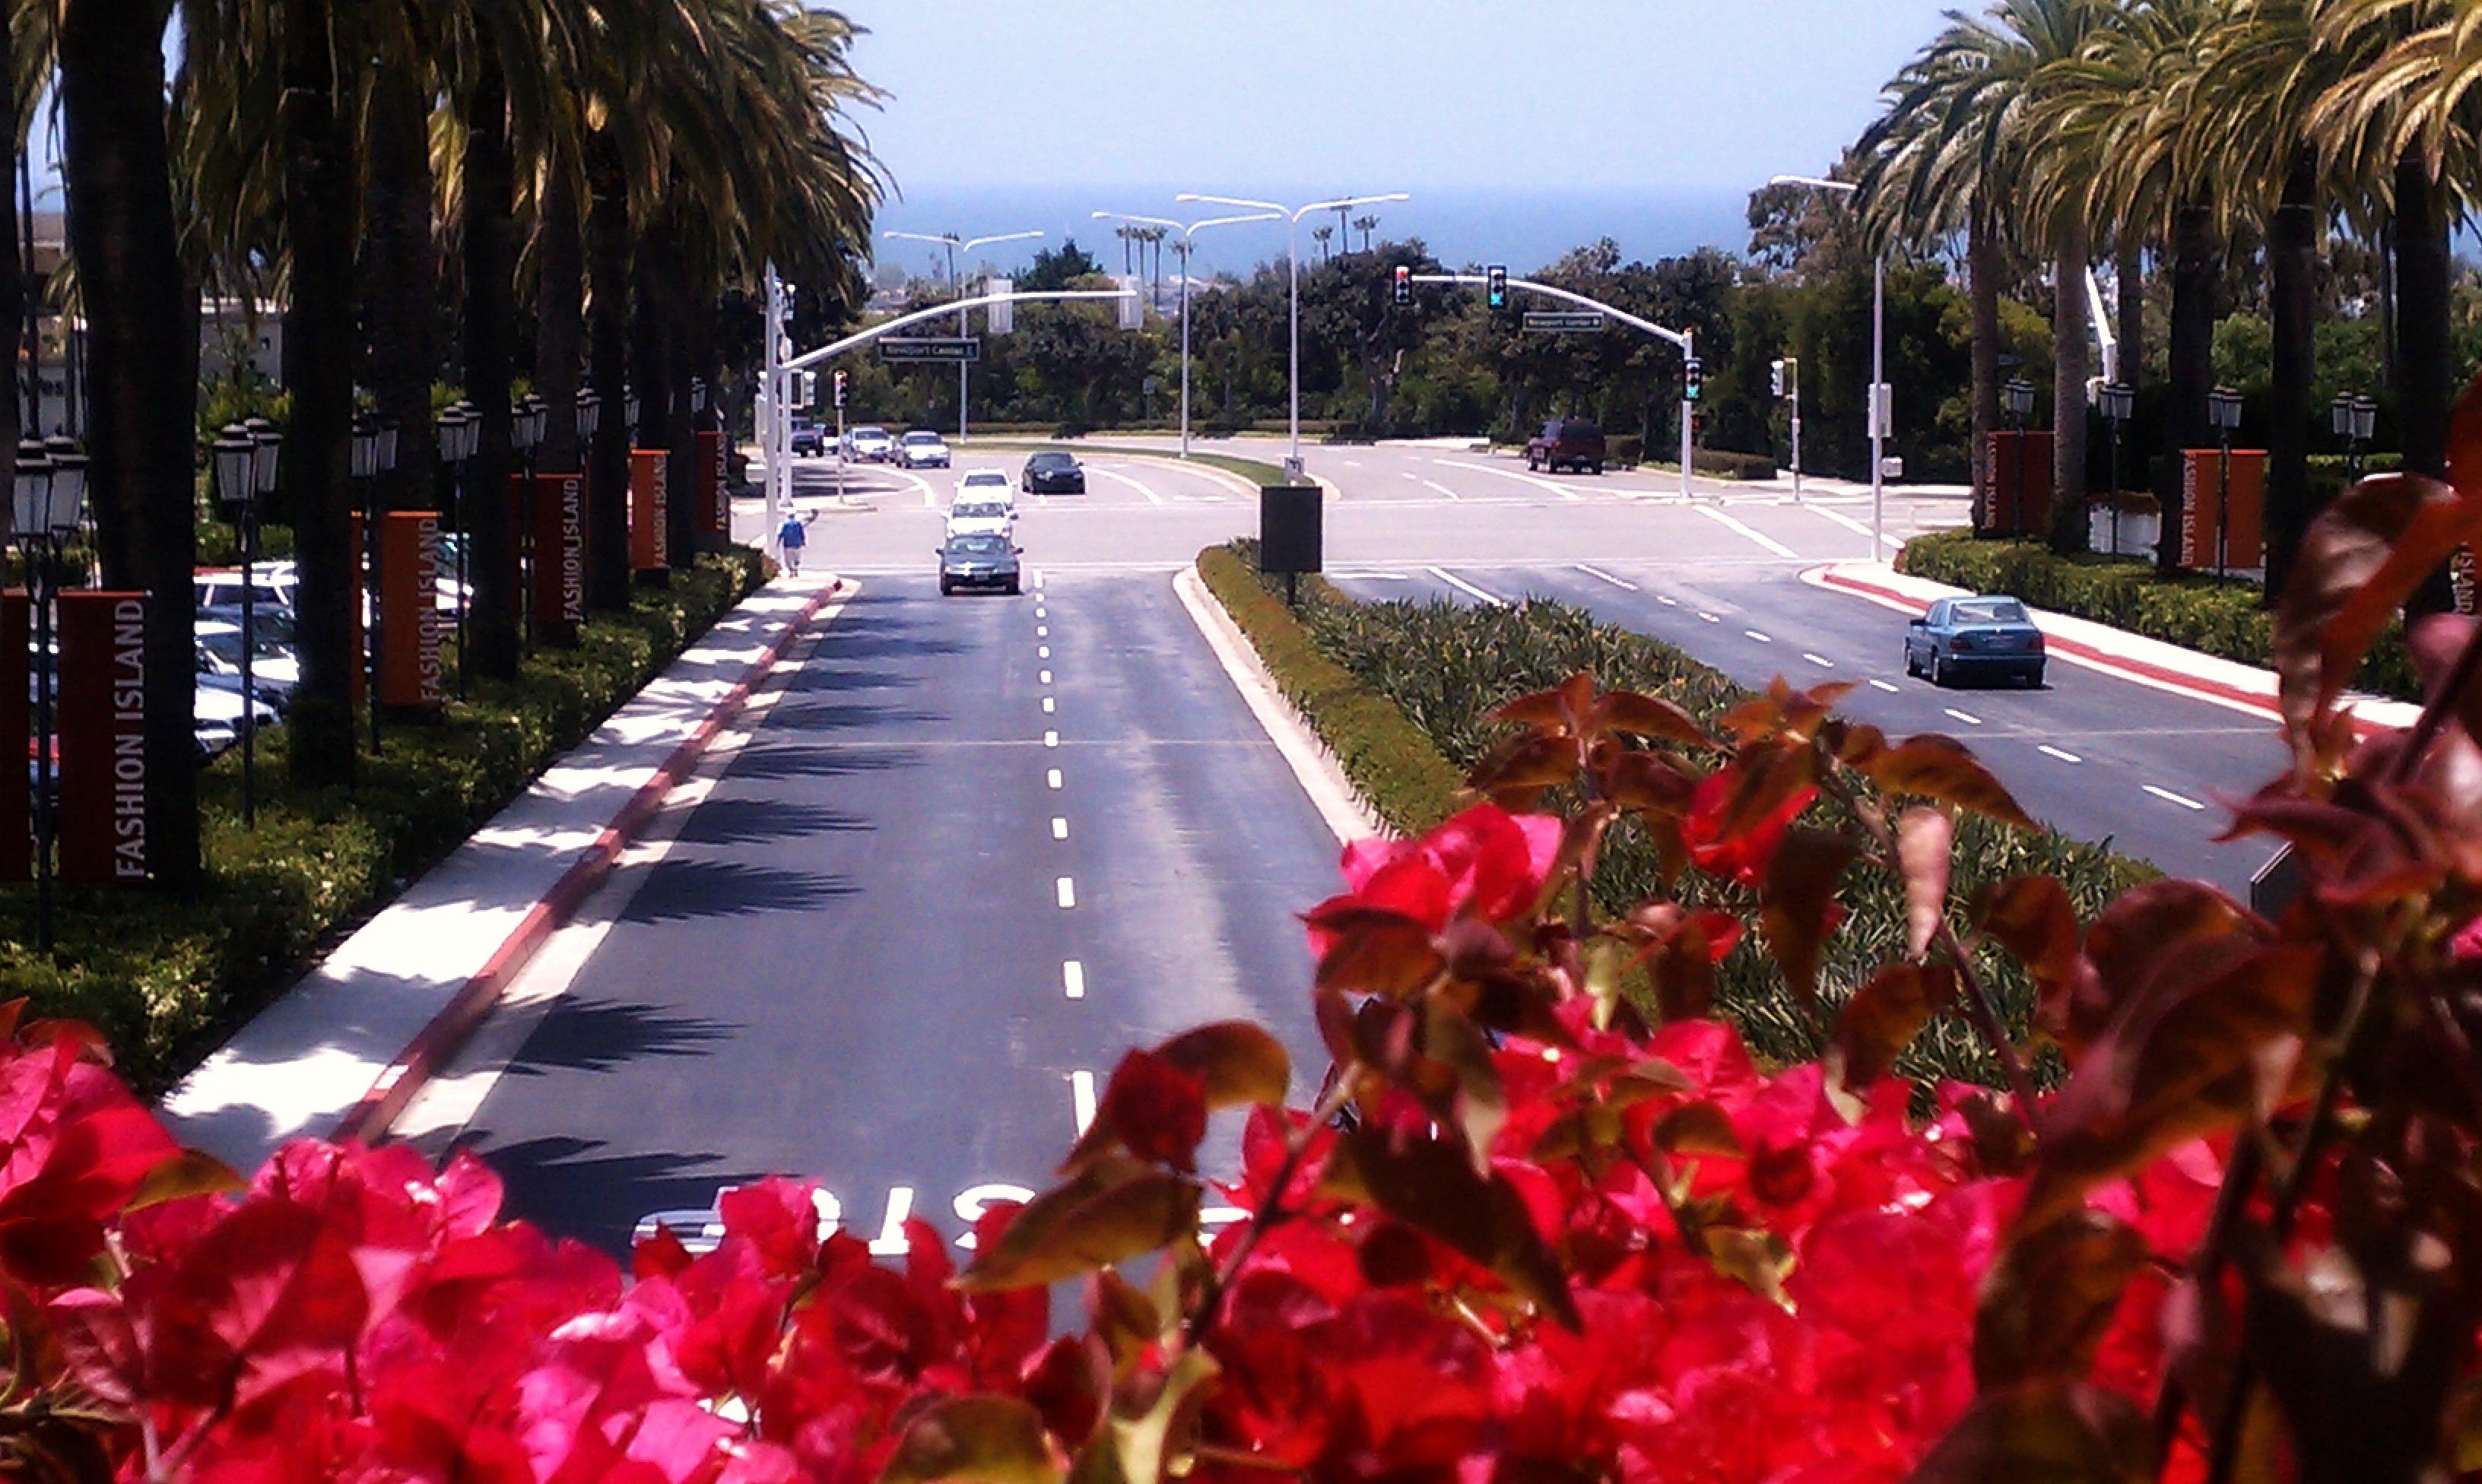 Orange County California - Visitor and 23